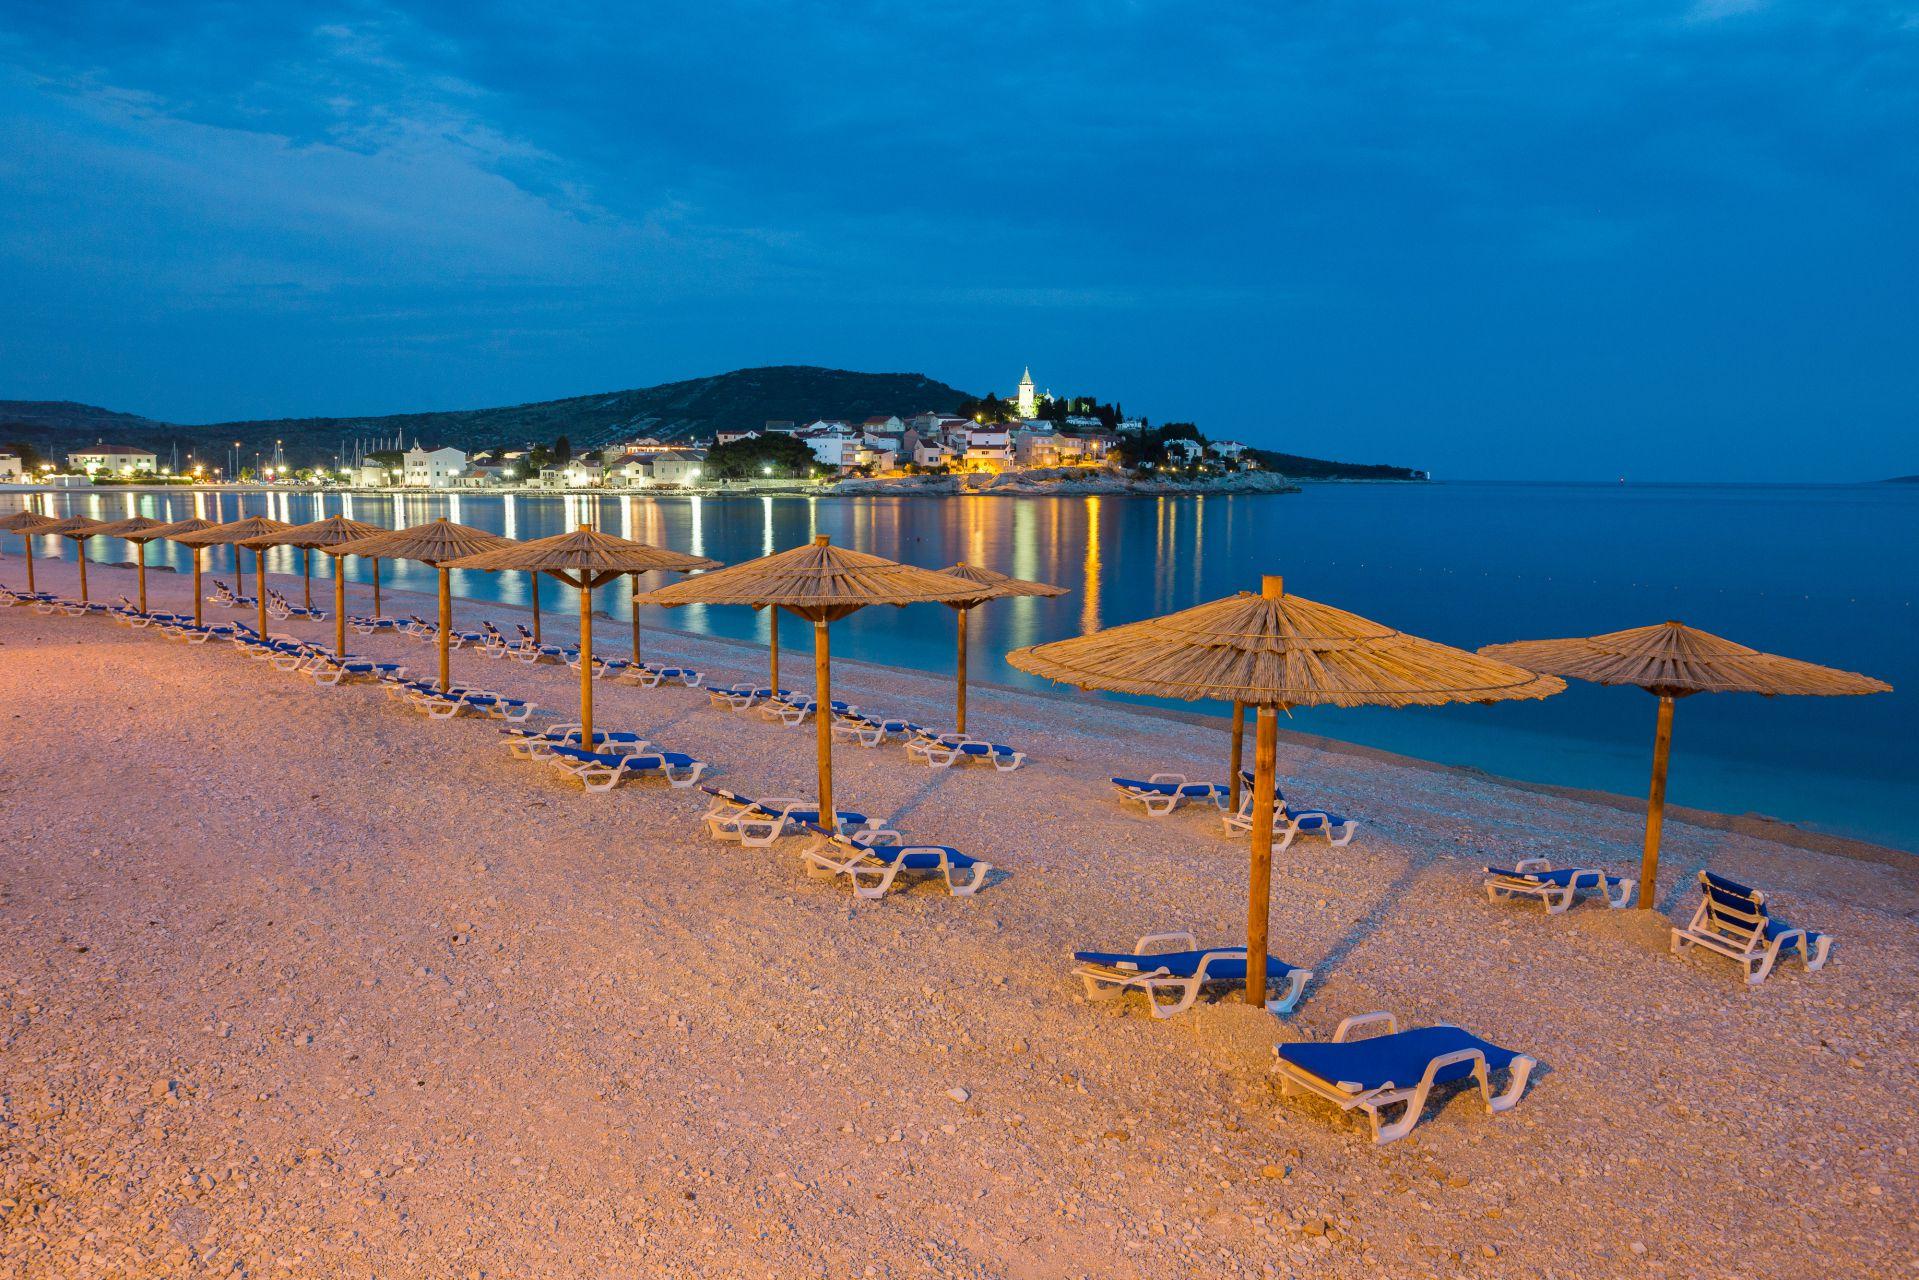 beach 09 14822836484 o 1 - Zora Hotel